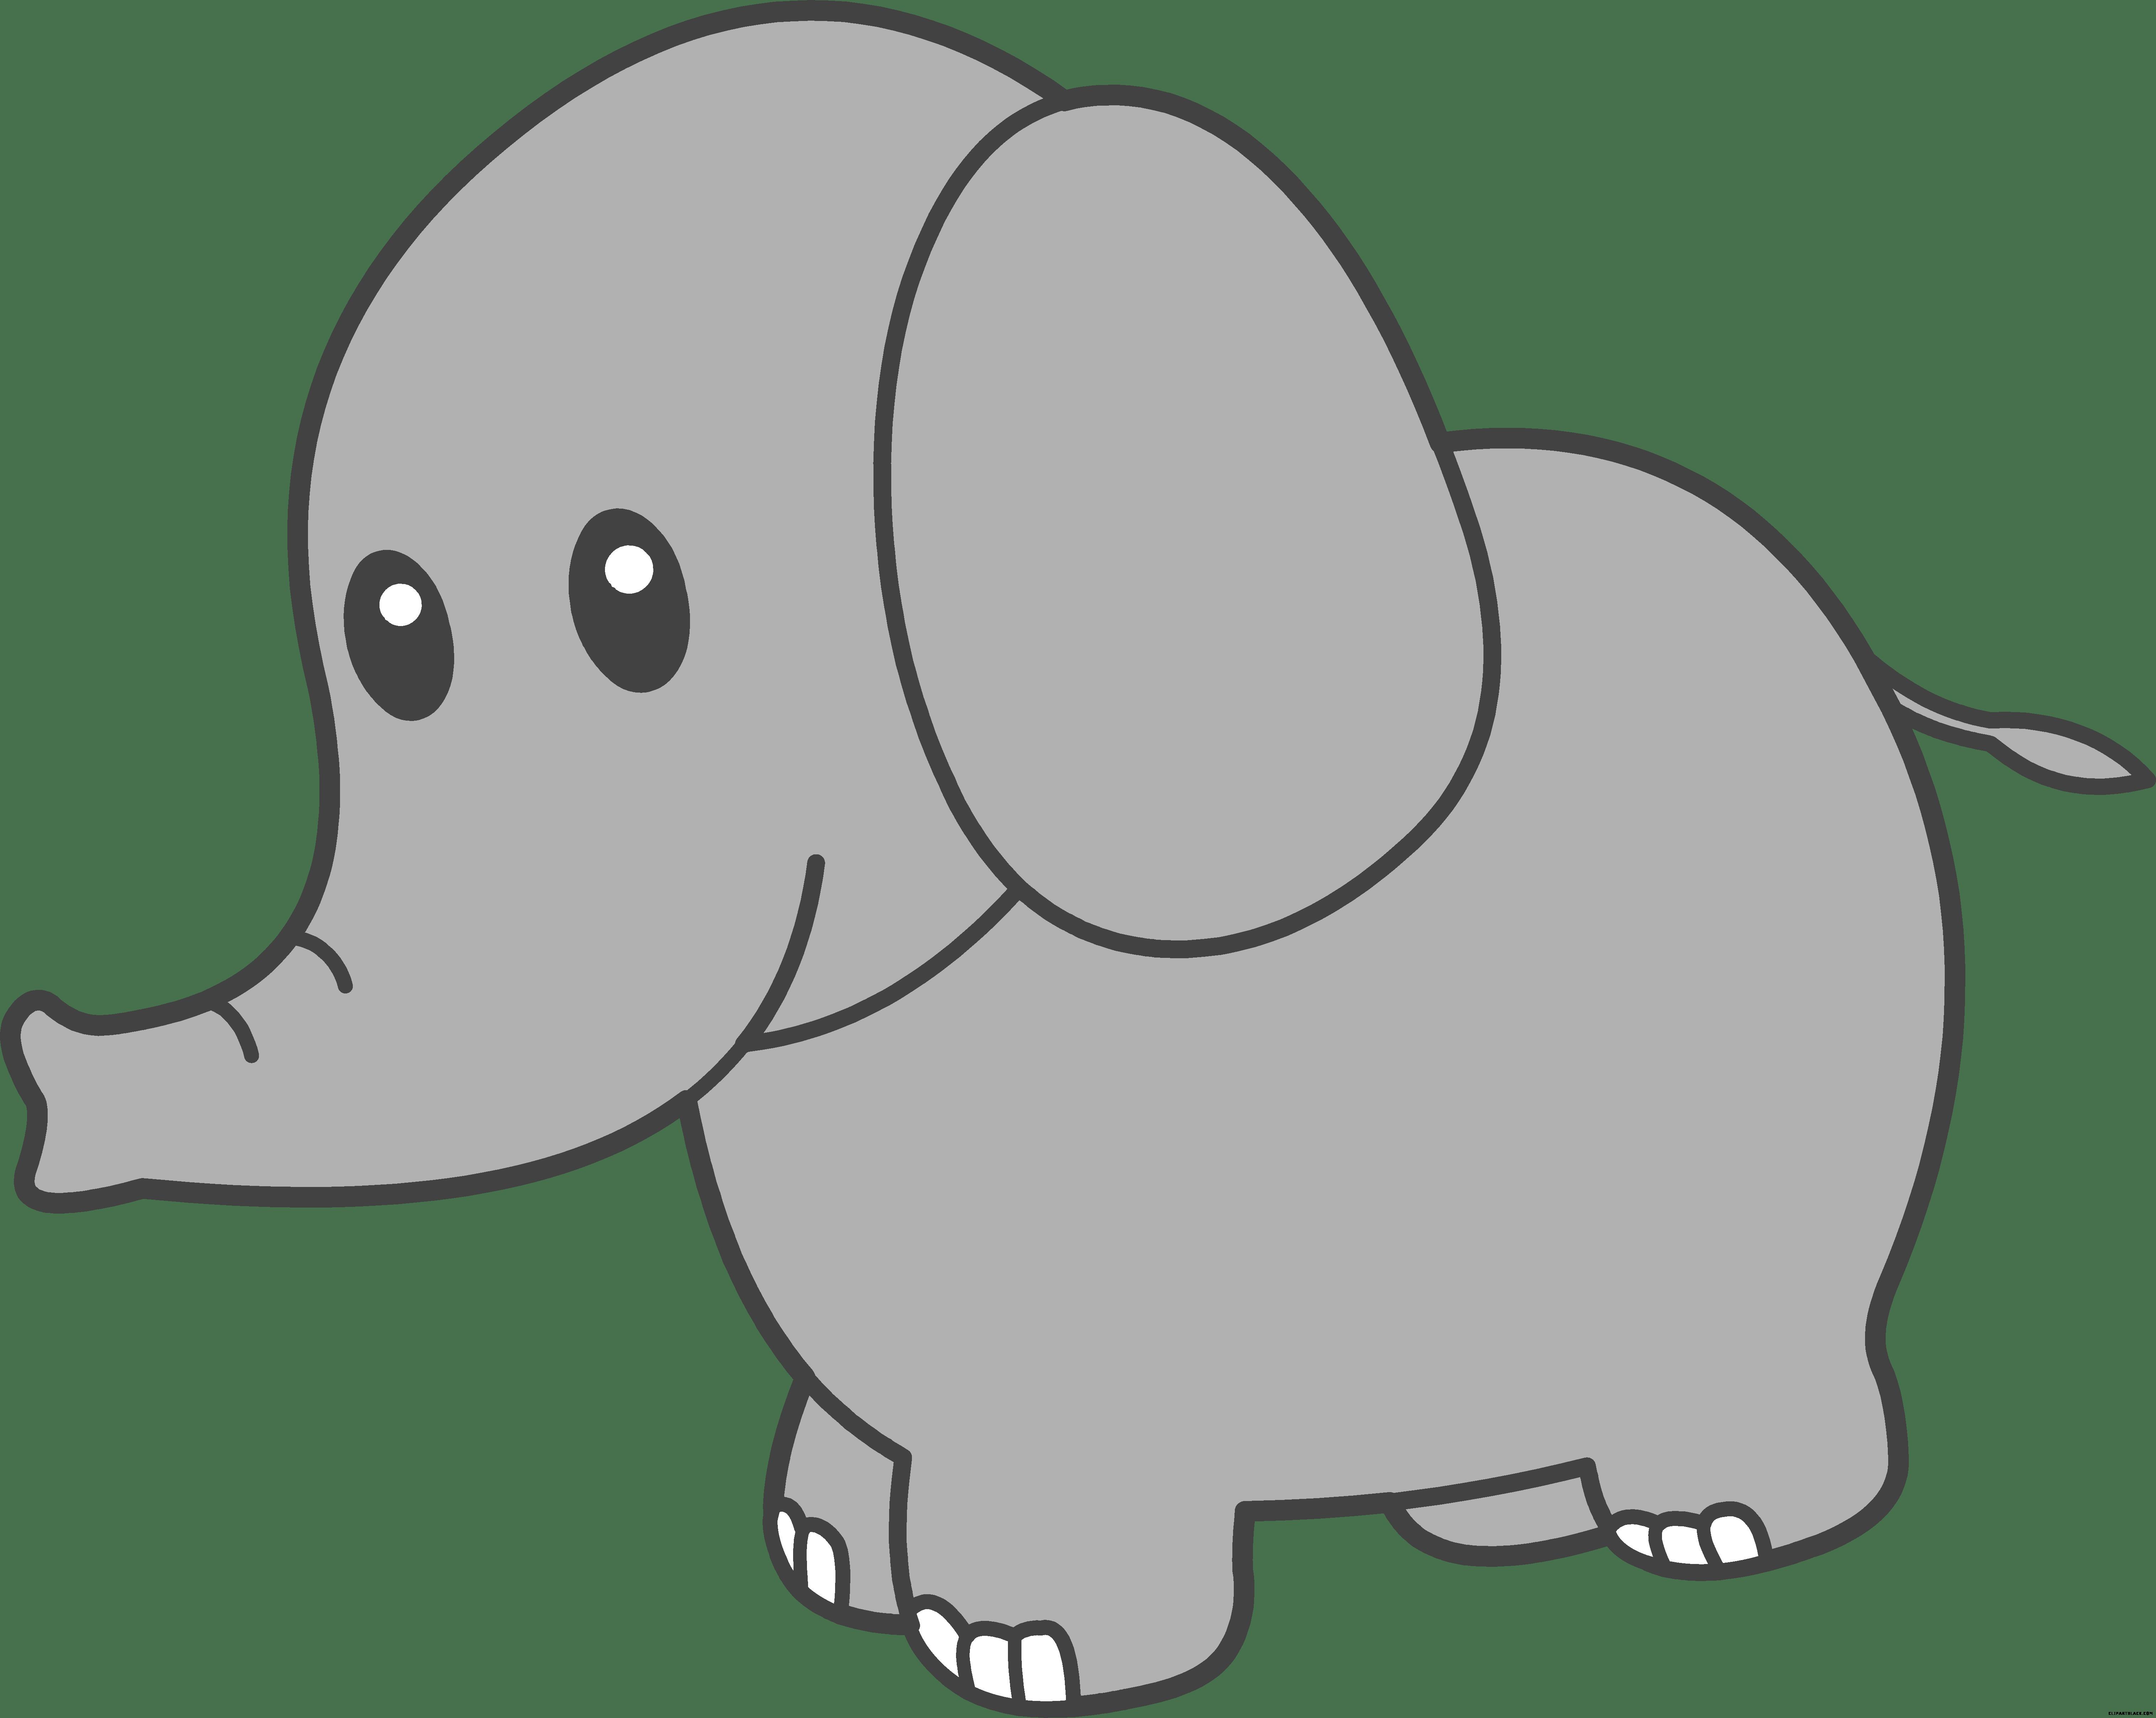 Clipart elephant black and white. Cute clipartblack com animal